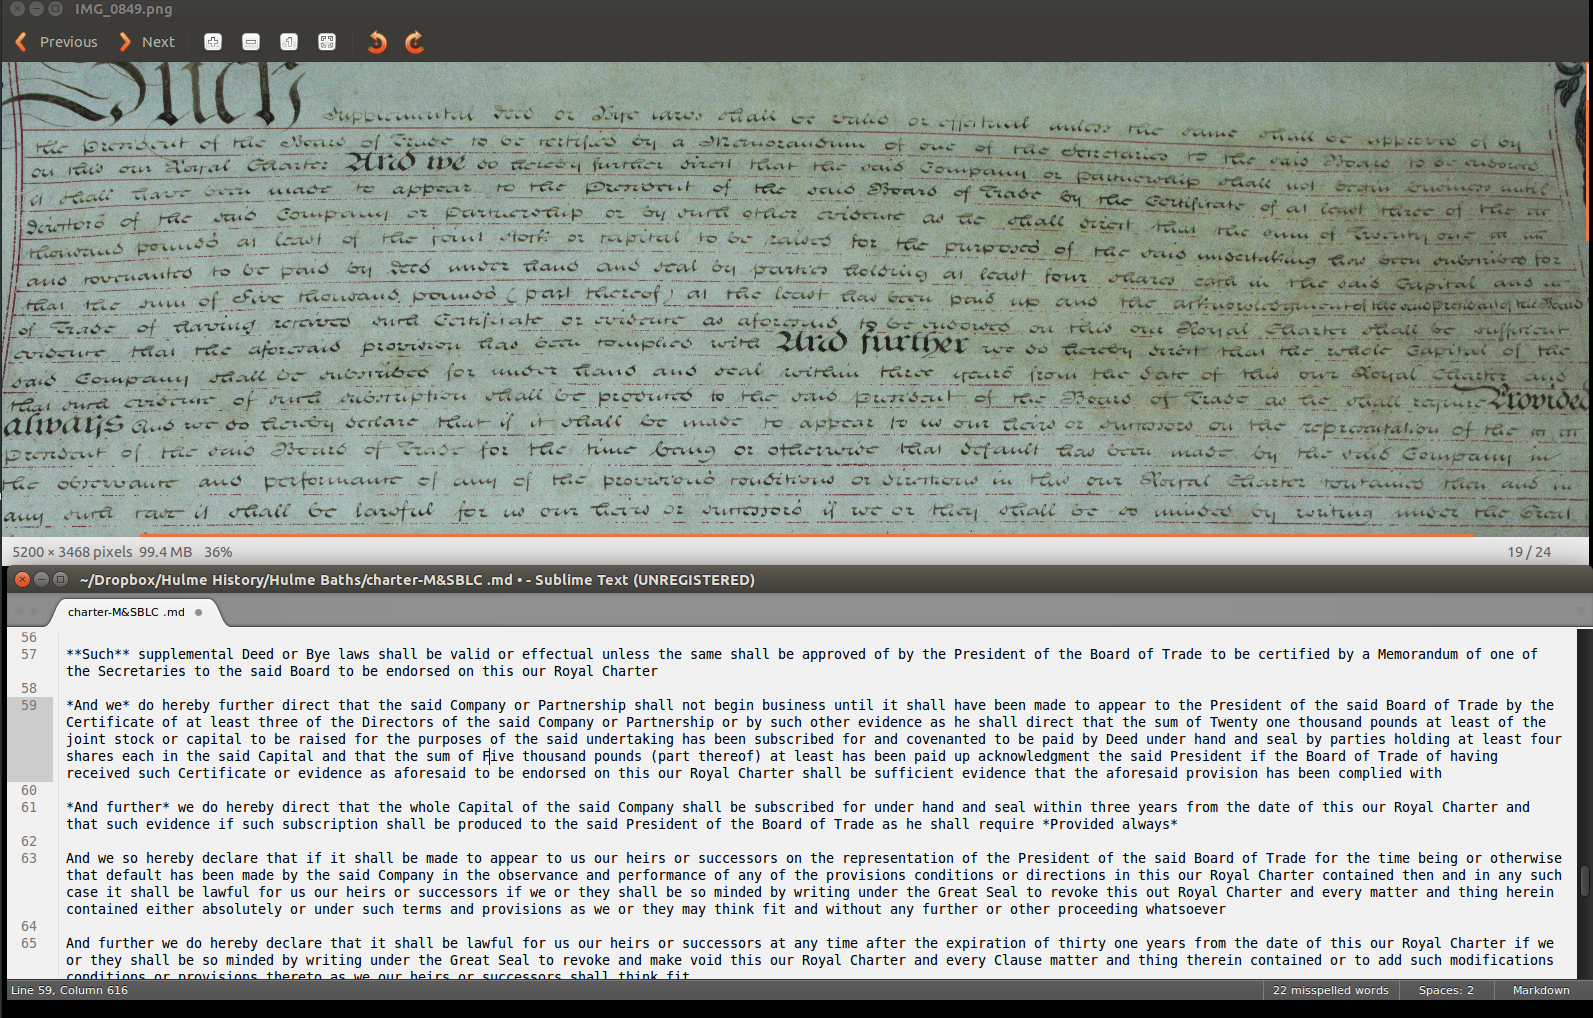 Screenshot showing Charter and transcription